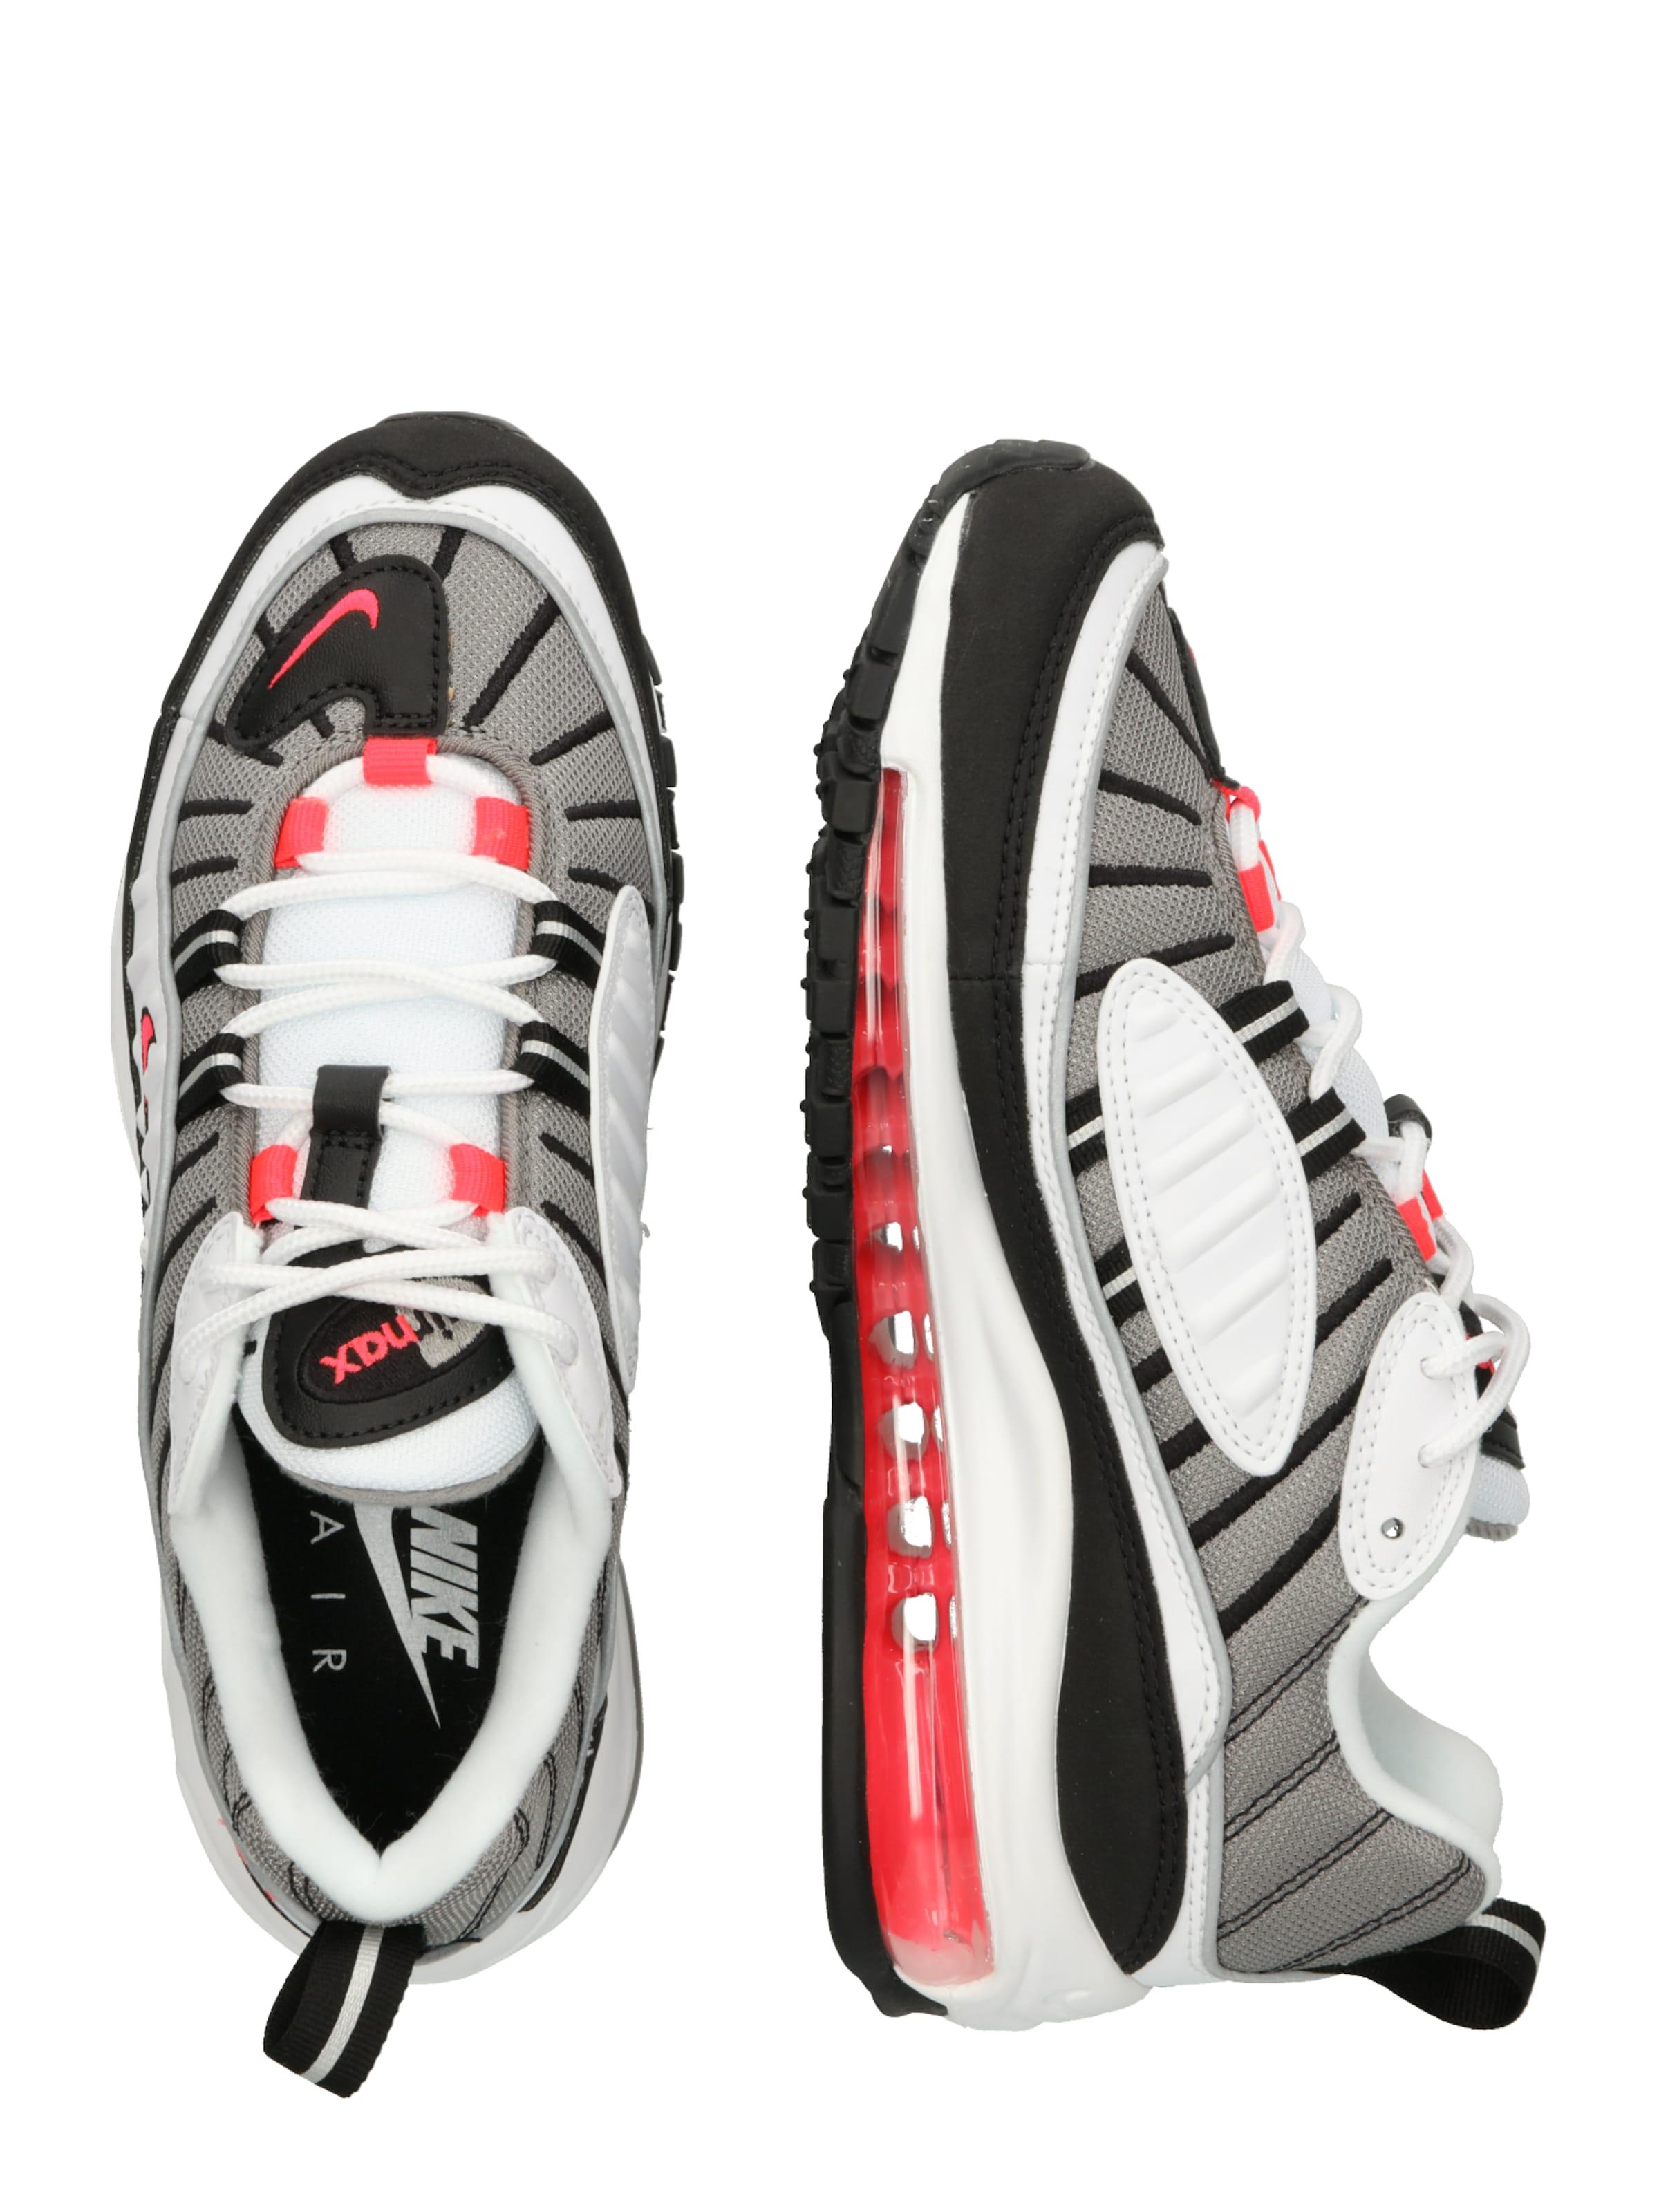 Baskets Max Blanc RougeNoir Nike Air Basses 'women's Shoe' Sportswear 98 En qMUzpSVG